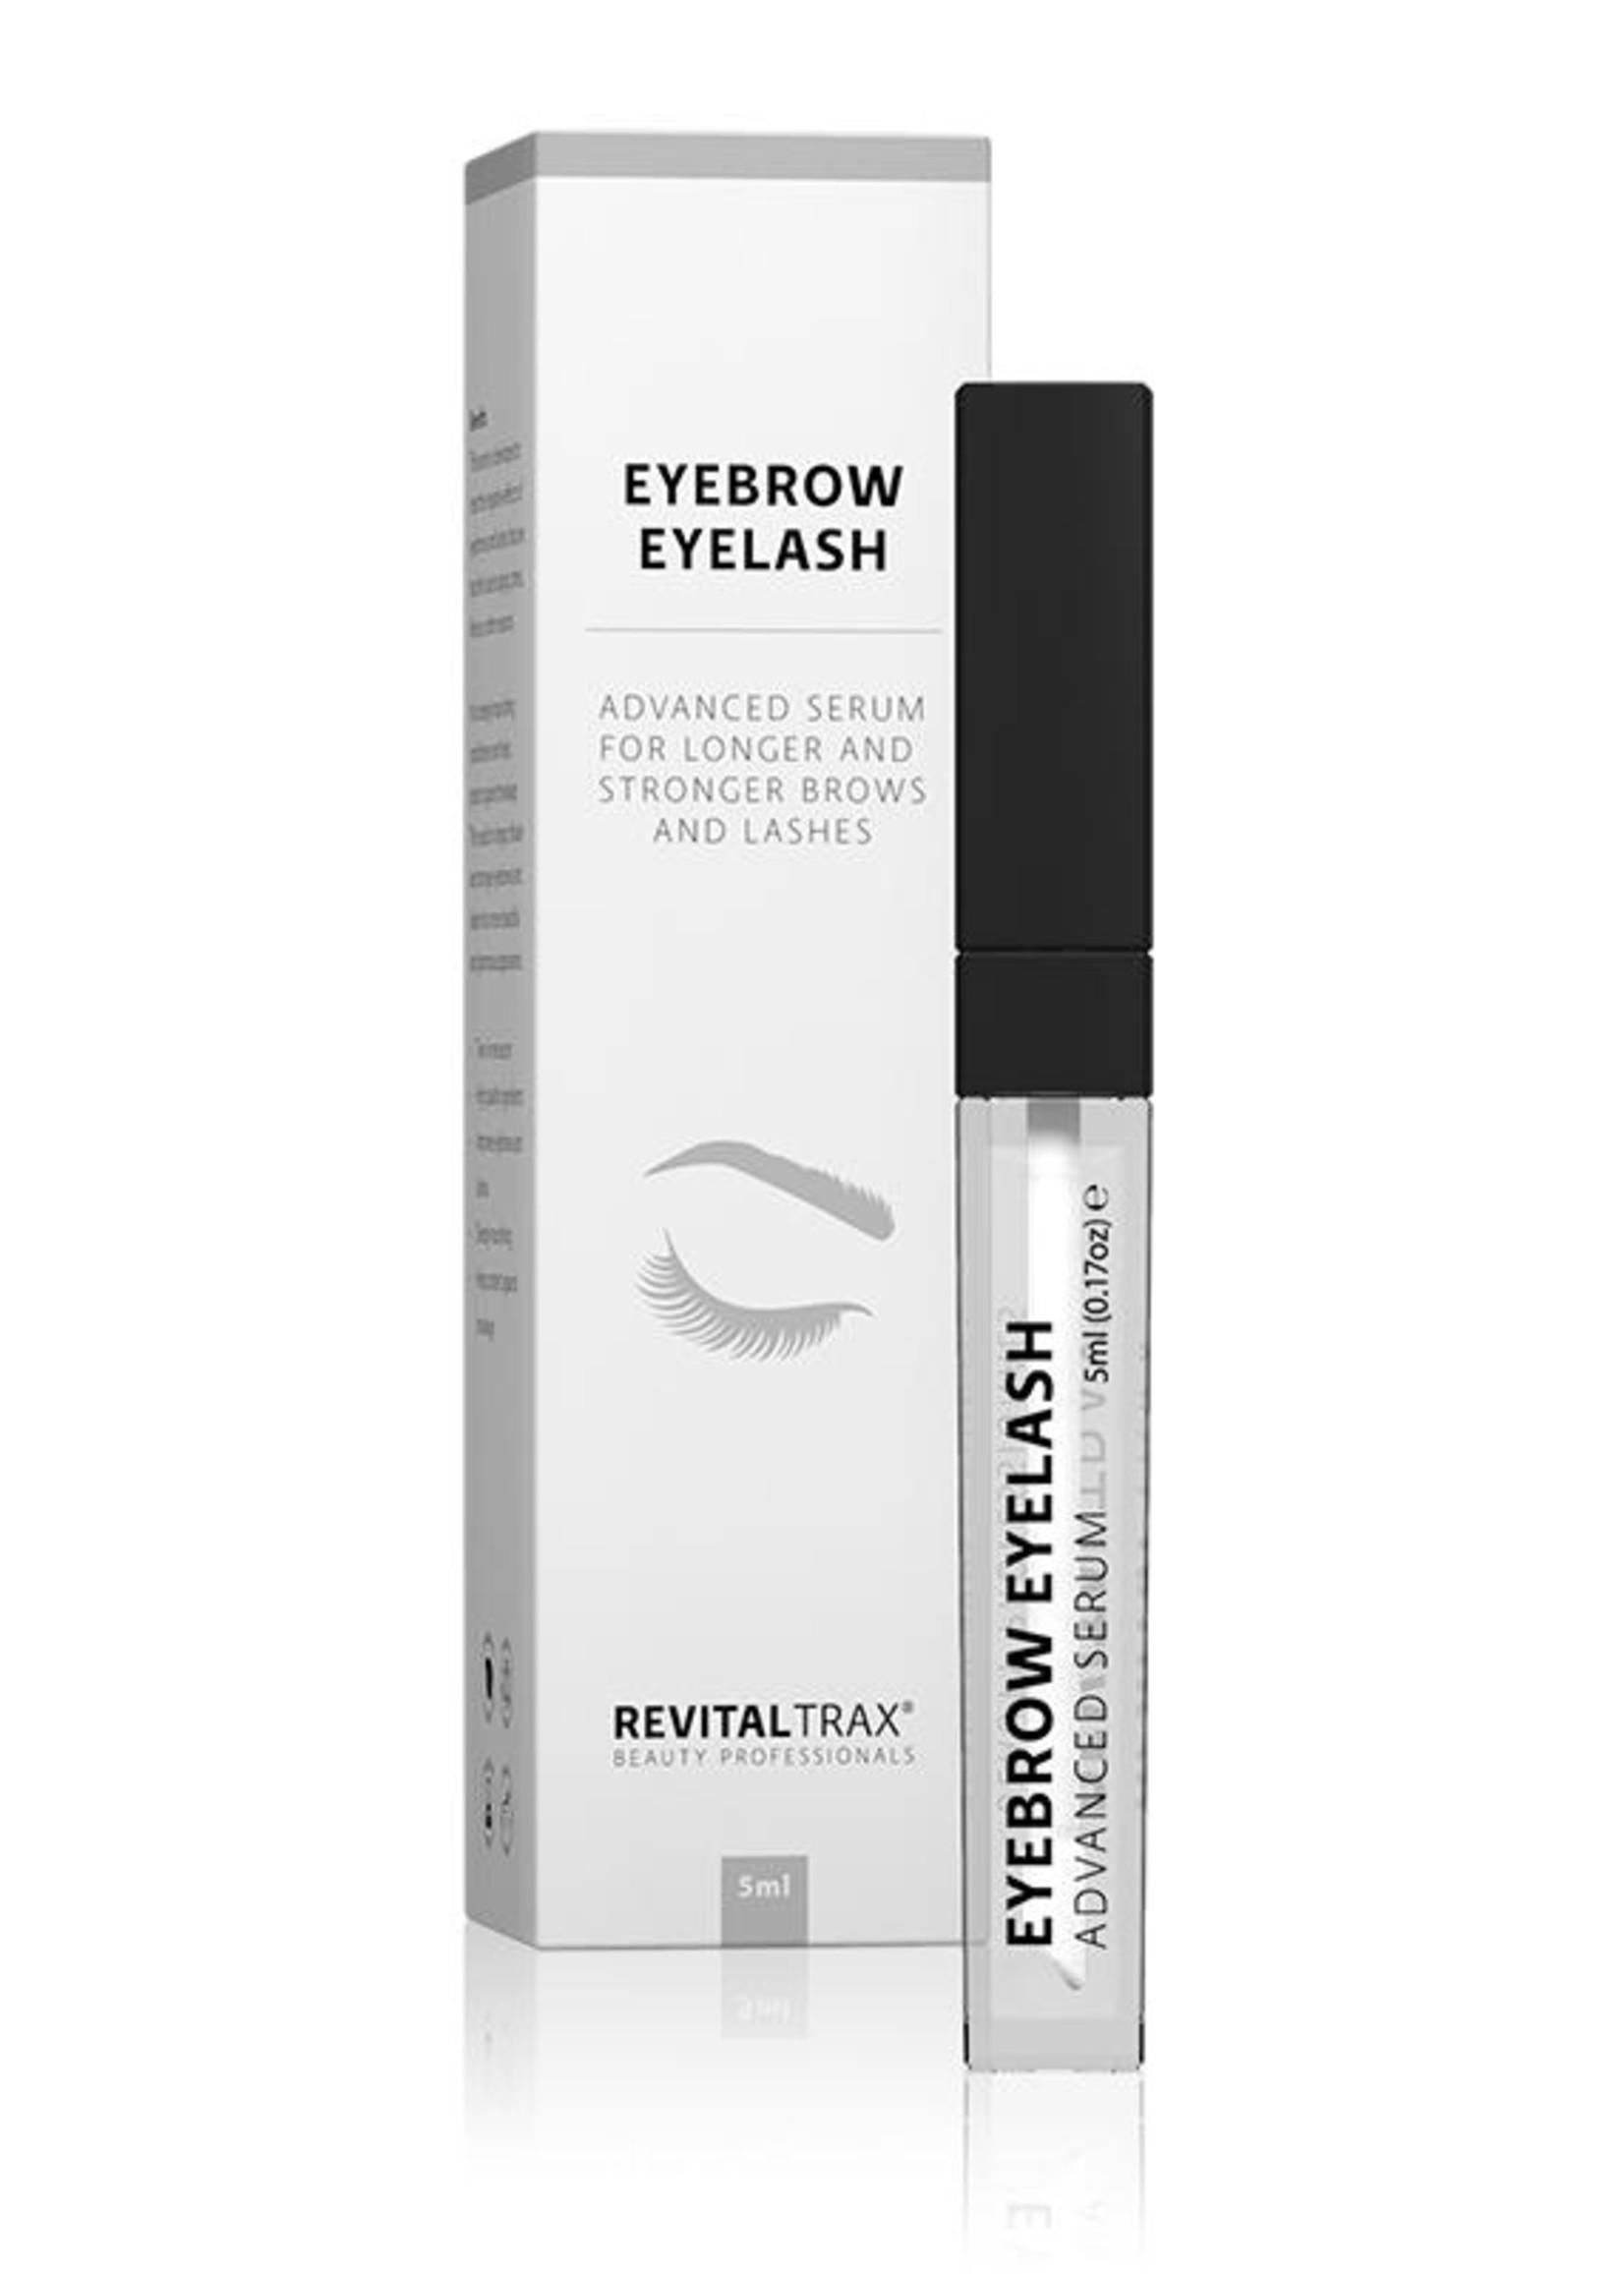 Revitaltrax Advanced Brow and Lash  Serum